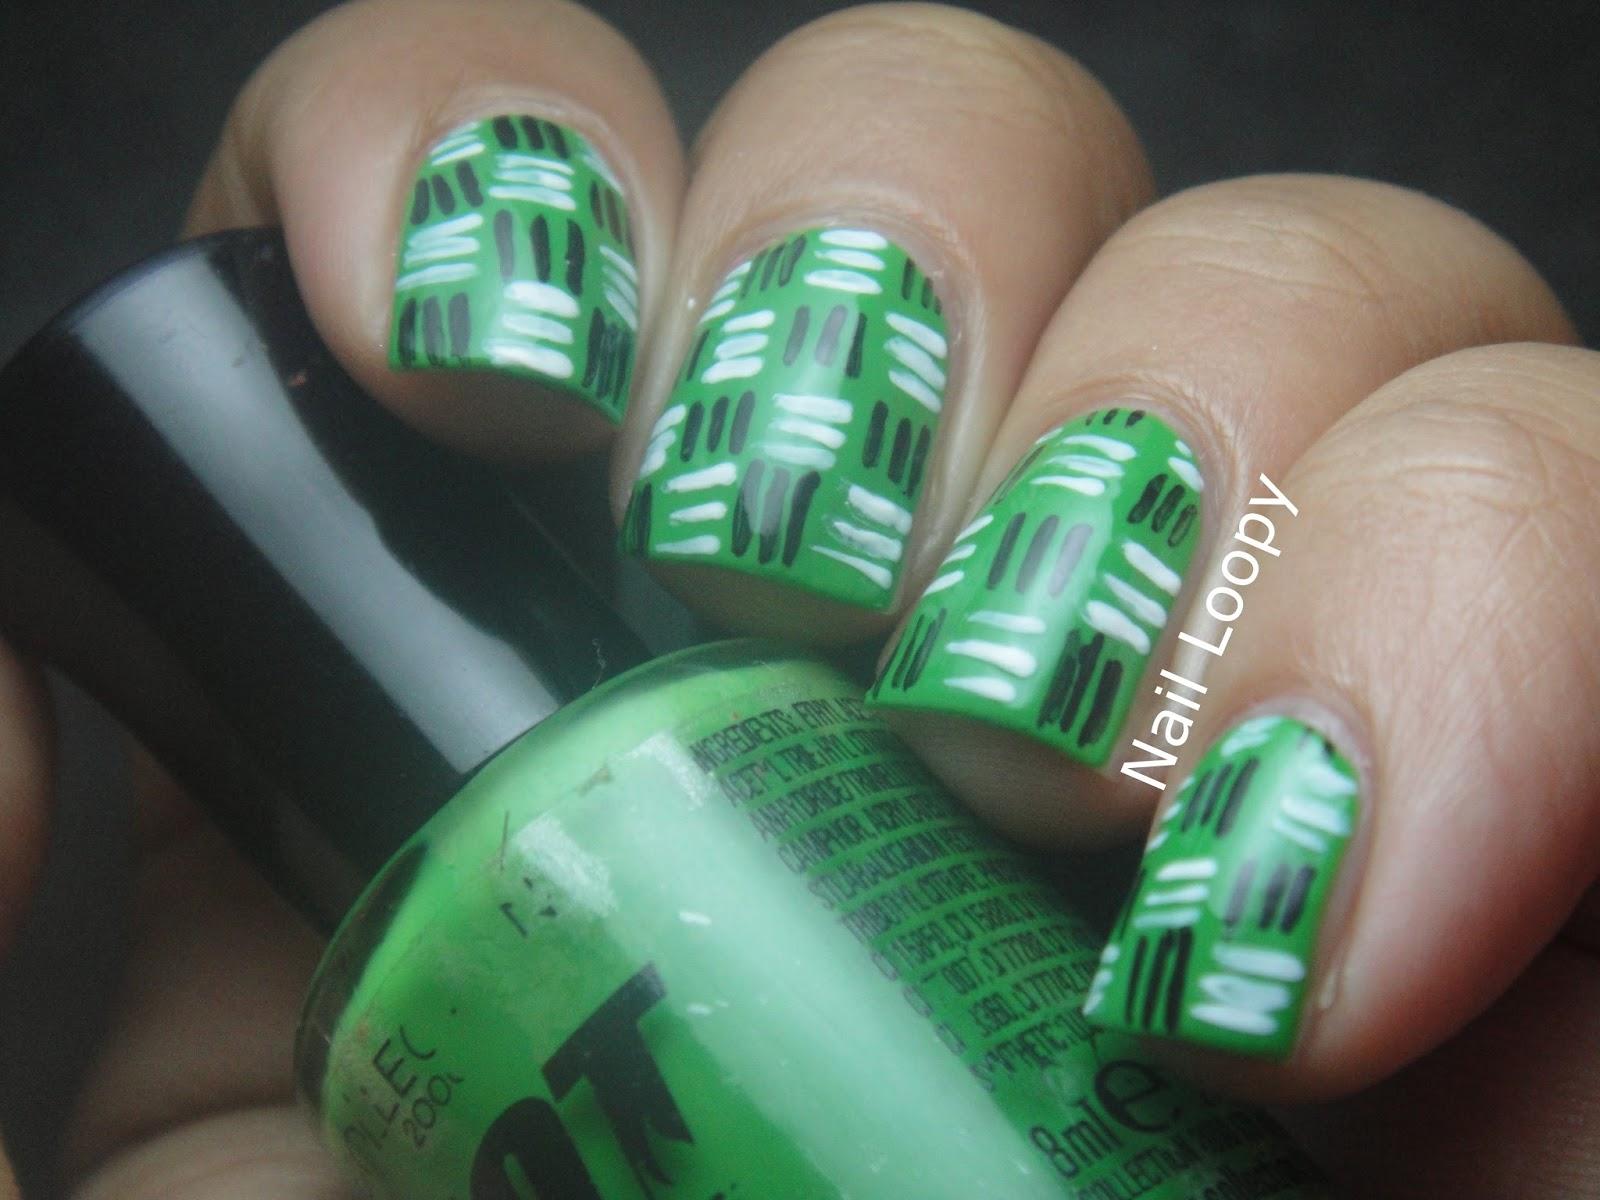 Nail art 2000 gallery nail art and nail design ideas nails design 2000 images collection 2000 ninja and prinsesfo gallery prinsesfo Choice Image